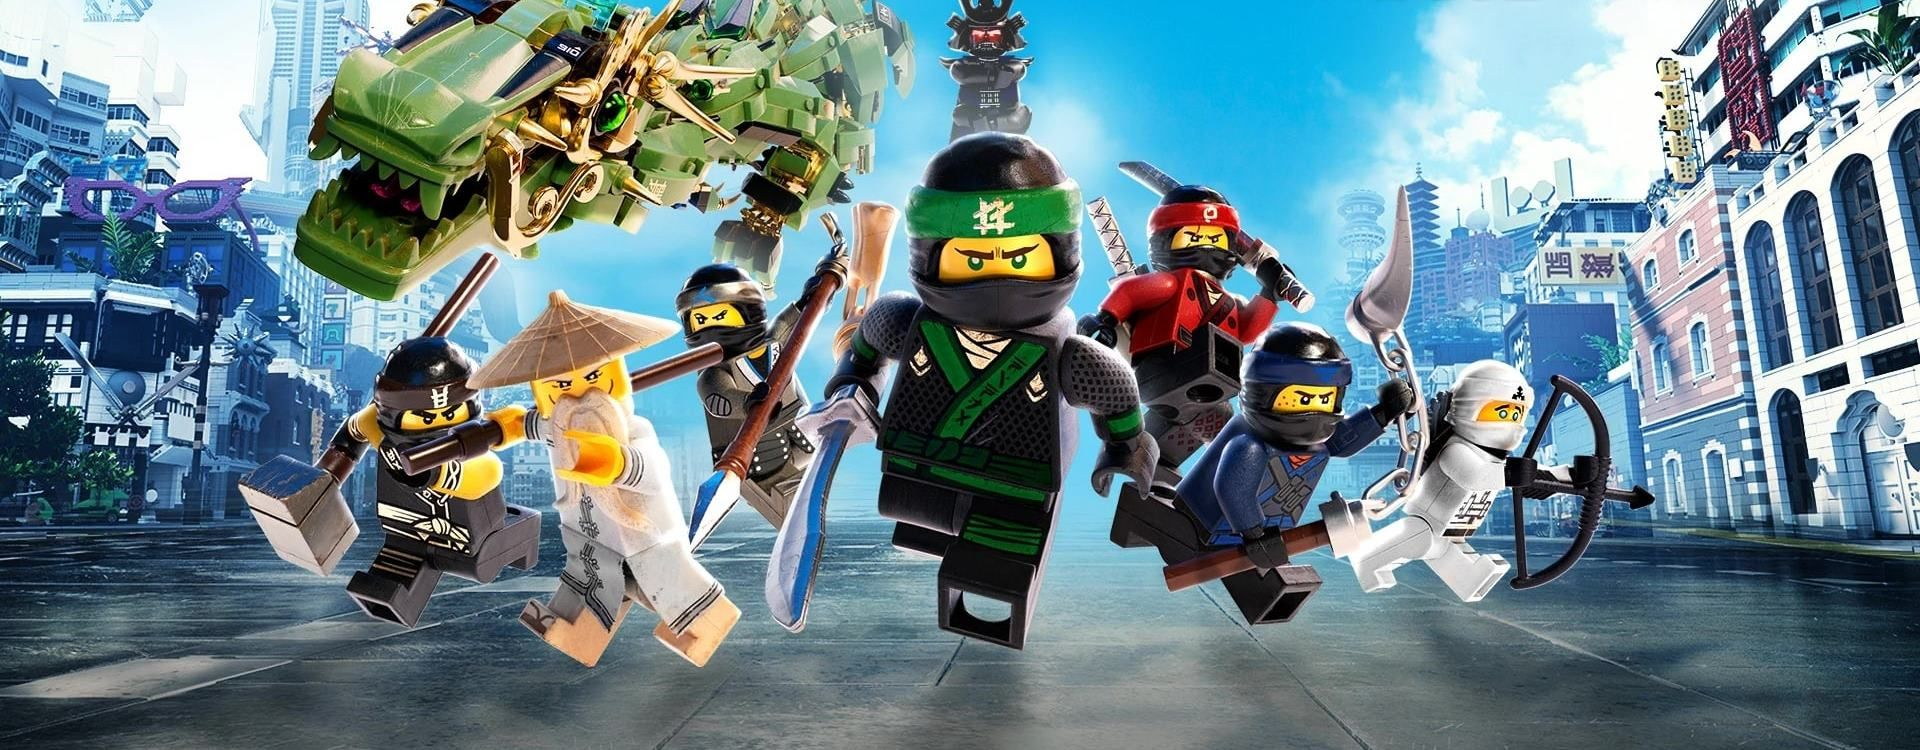 Kids N Fun Com Coloring Page Lego Ninjago Lego Ninjago Lego Ninjago Ninjago Coloring Pages Ninjago